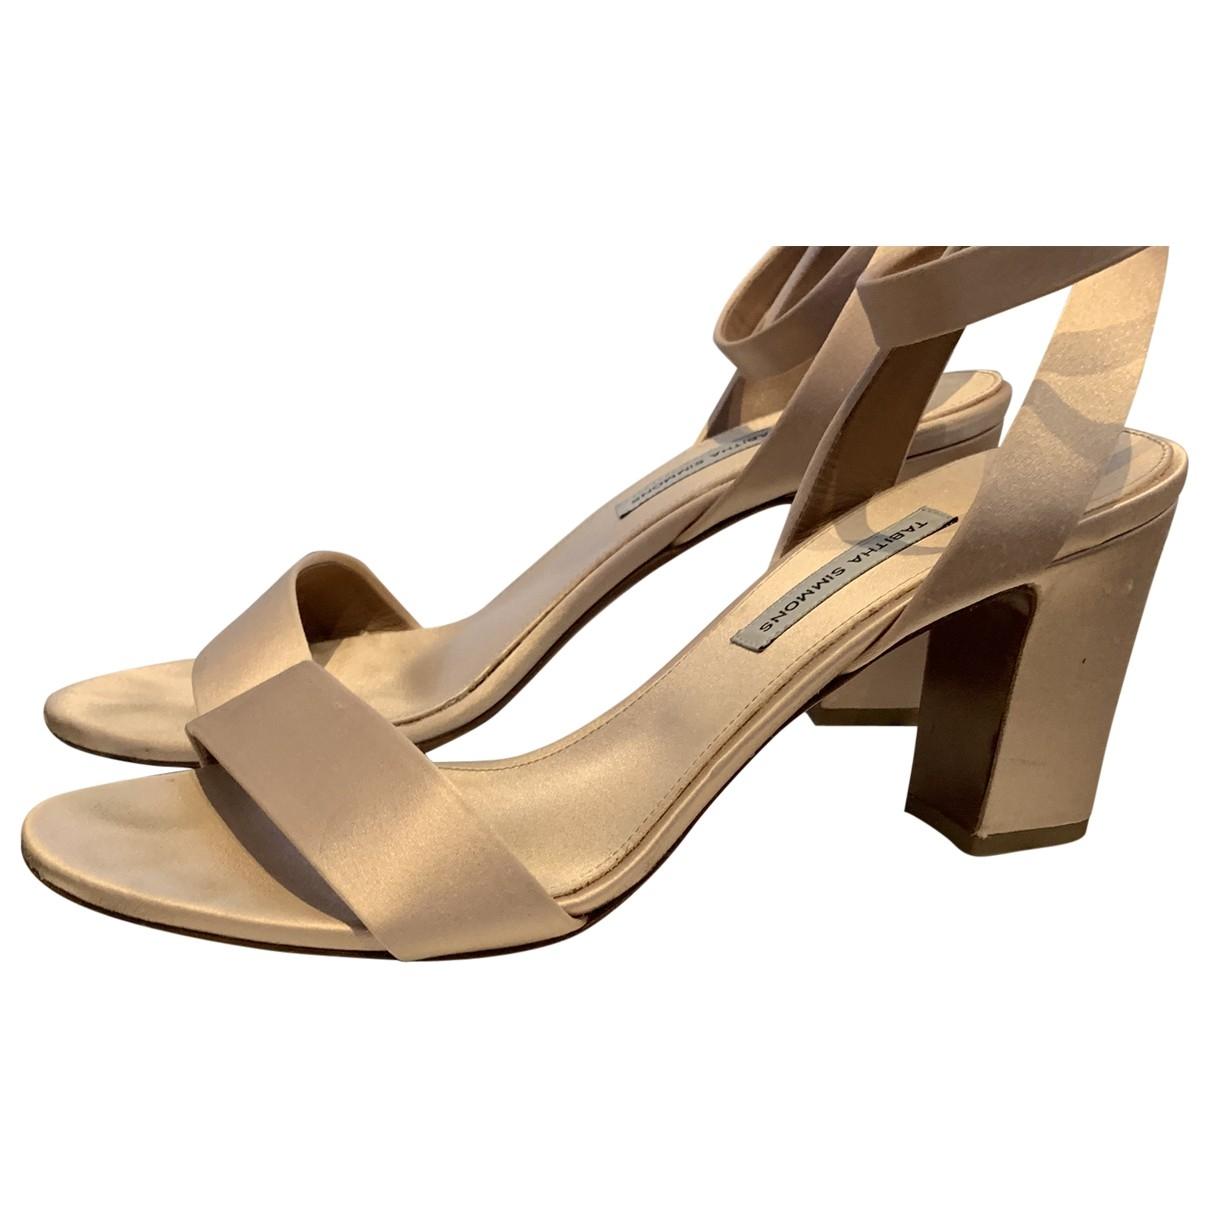 Tabitha Simmons \N Pink Leather Heels for Women 40 EU